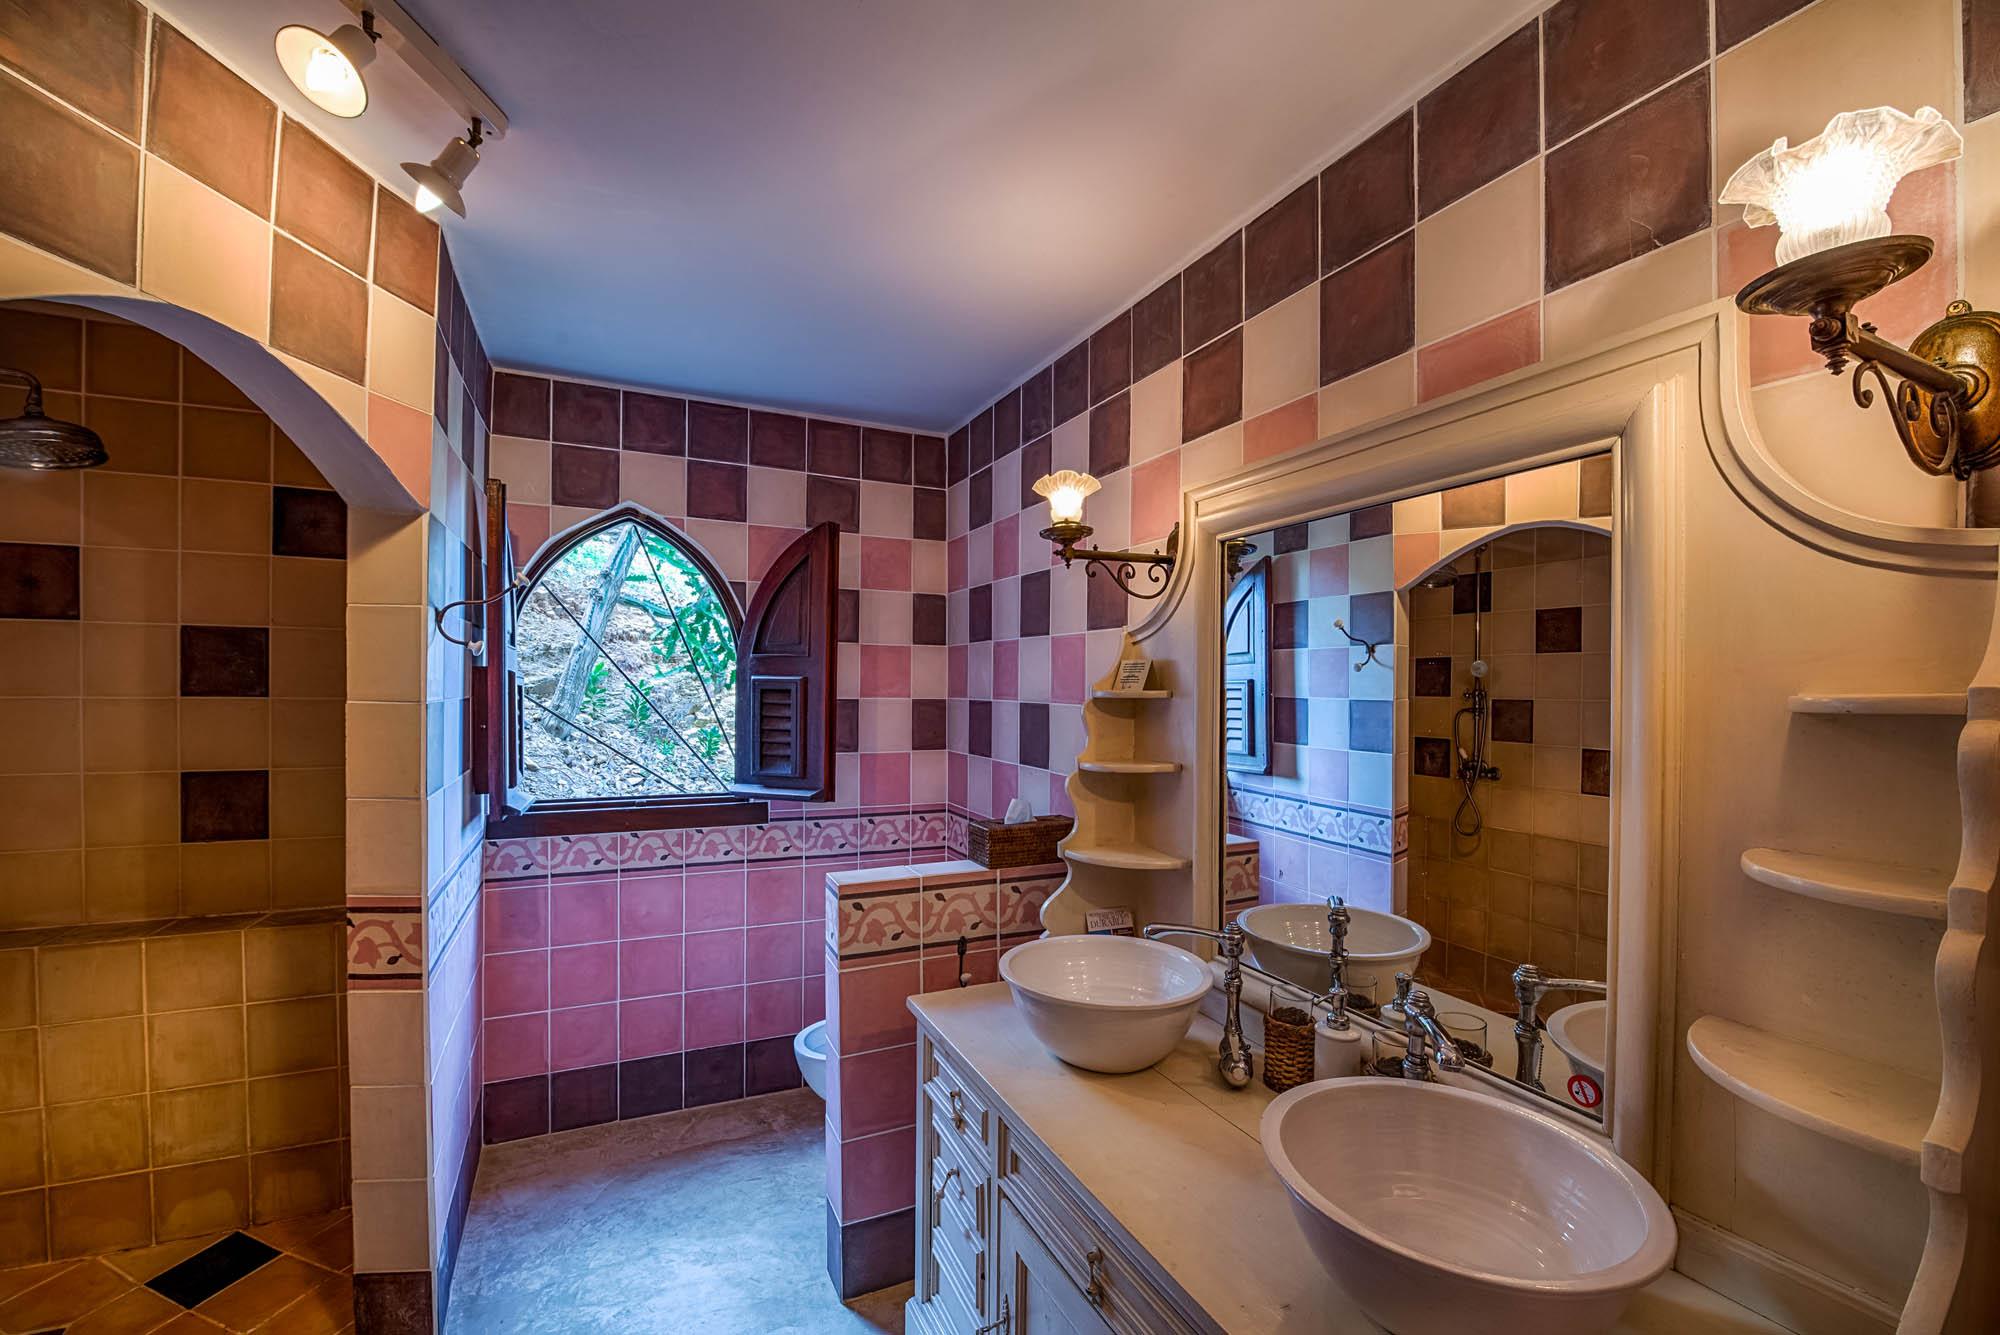 One of the beautiful designed bathrooms at Le Mas des Sables villa rental, Baie aux Cayes, Terres Basses, Saint Martin, Caribbean.